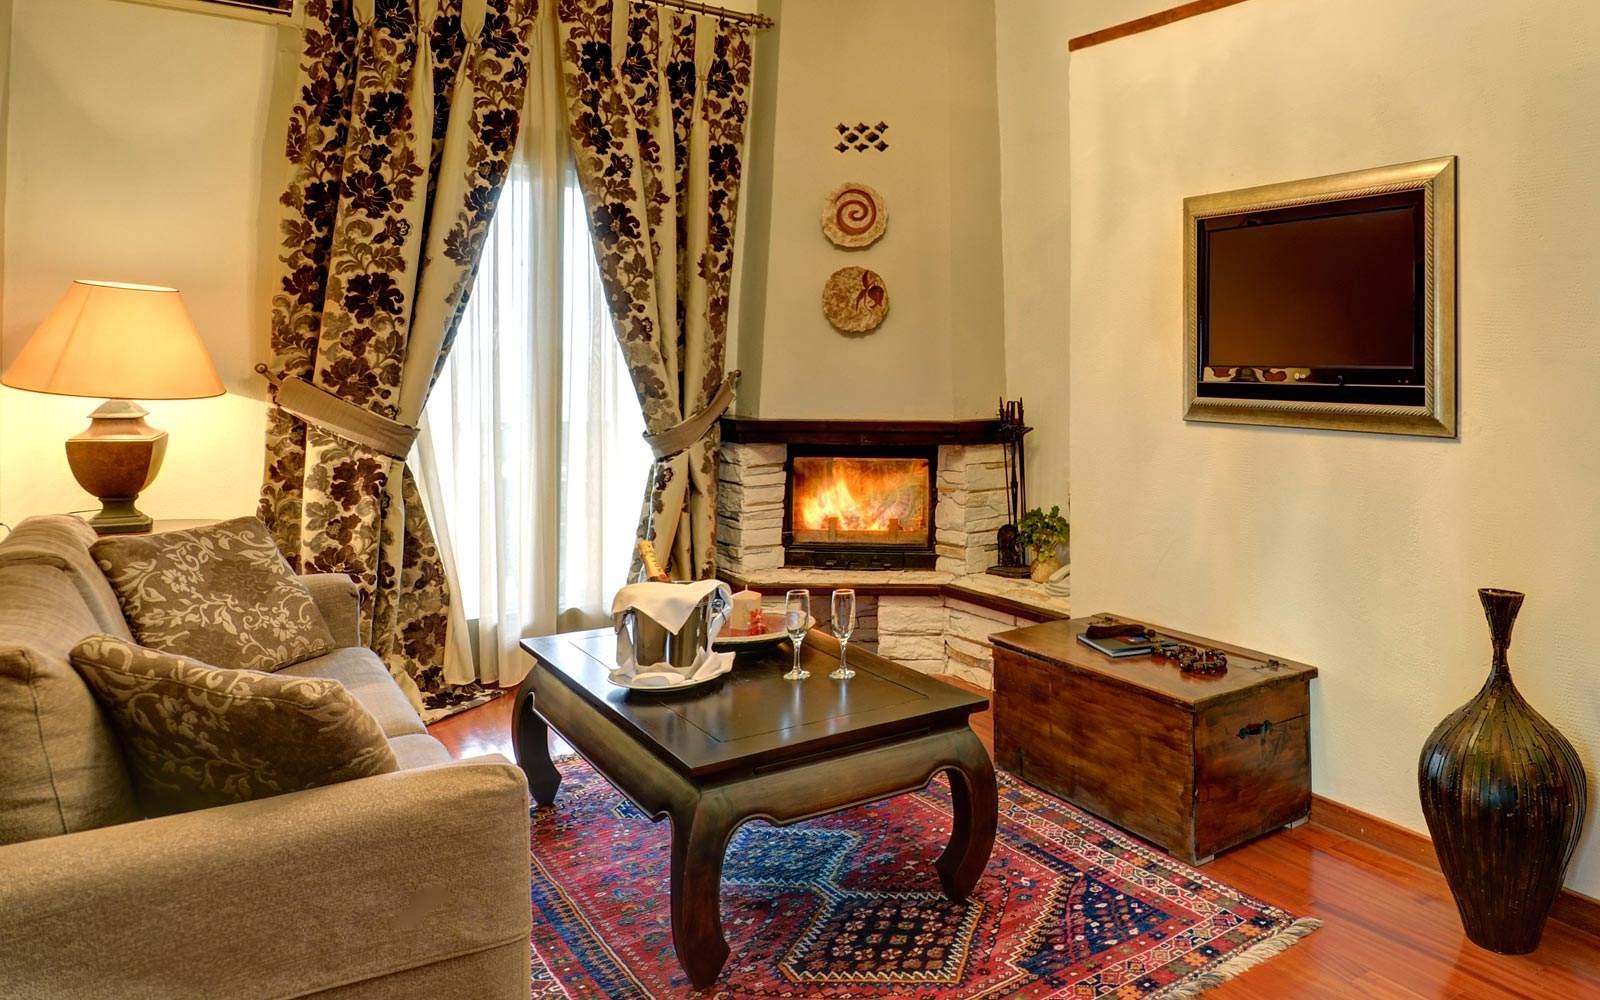 4* Naiades Hotel - Λίμνη Πλαστήρα ✦ -50% ✦ 3 Ημέρες